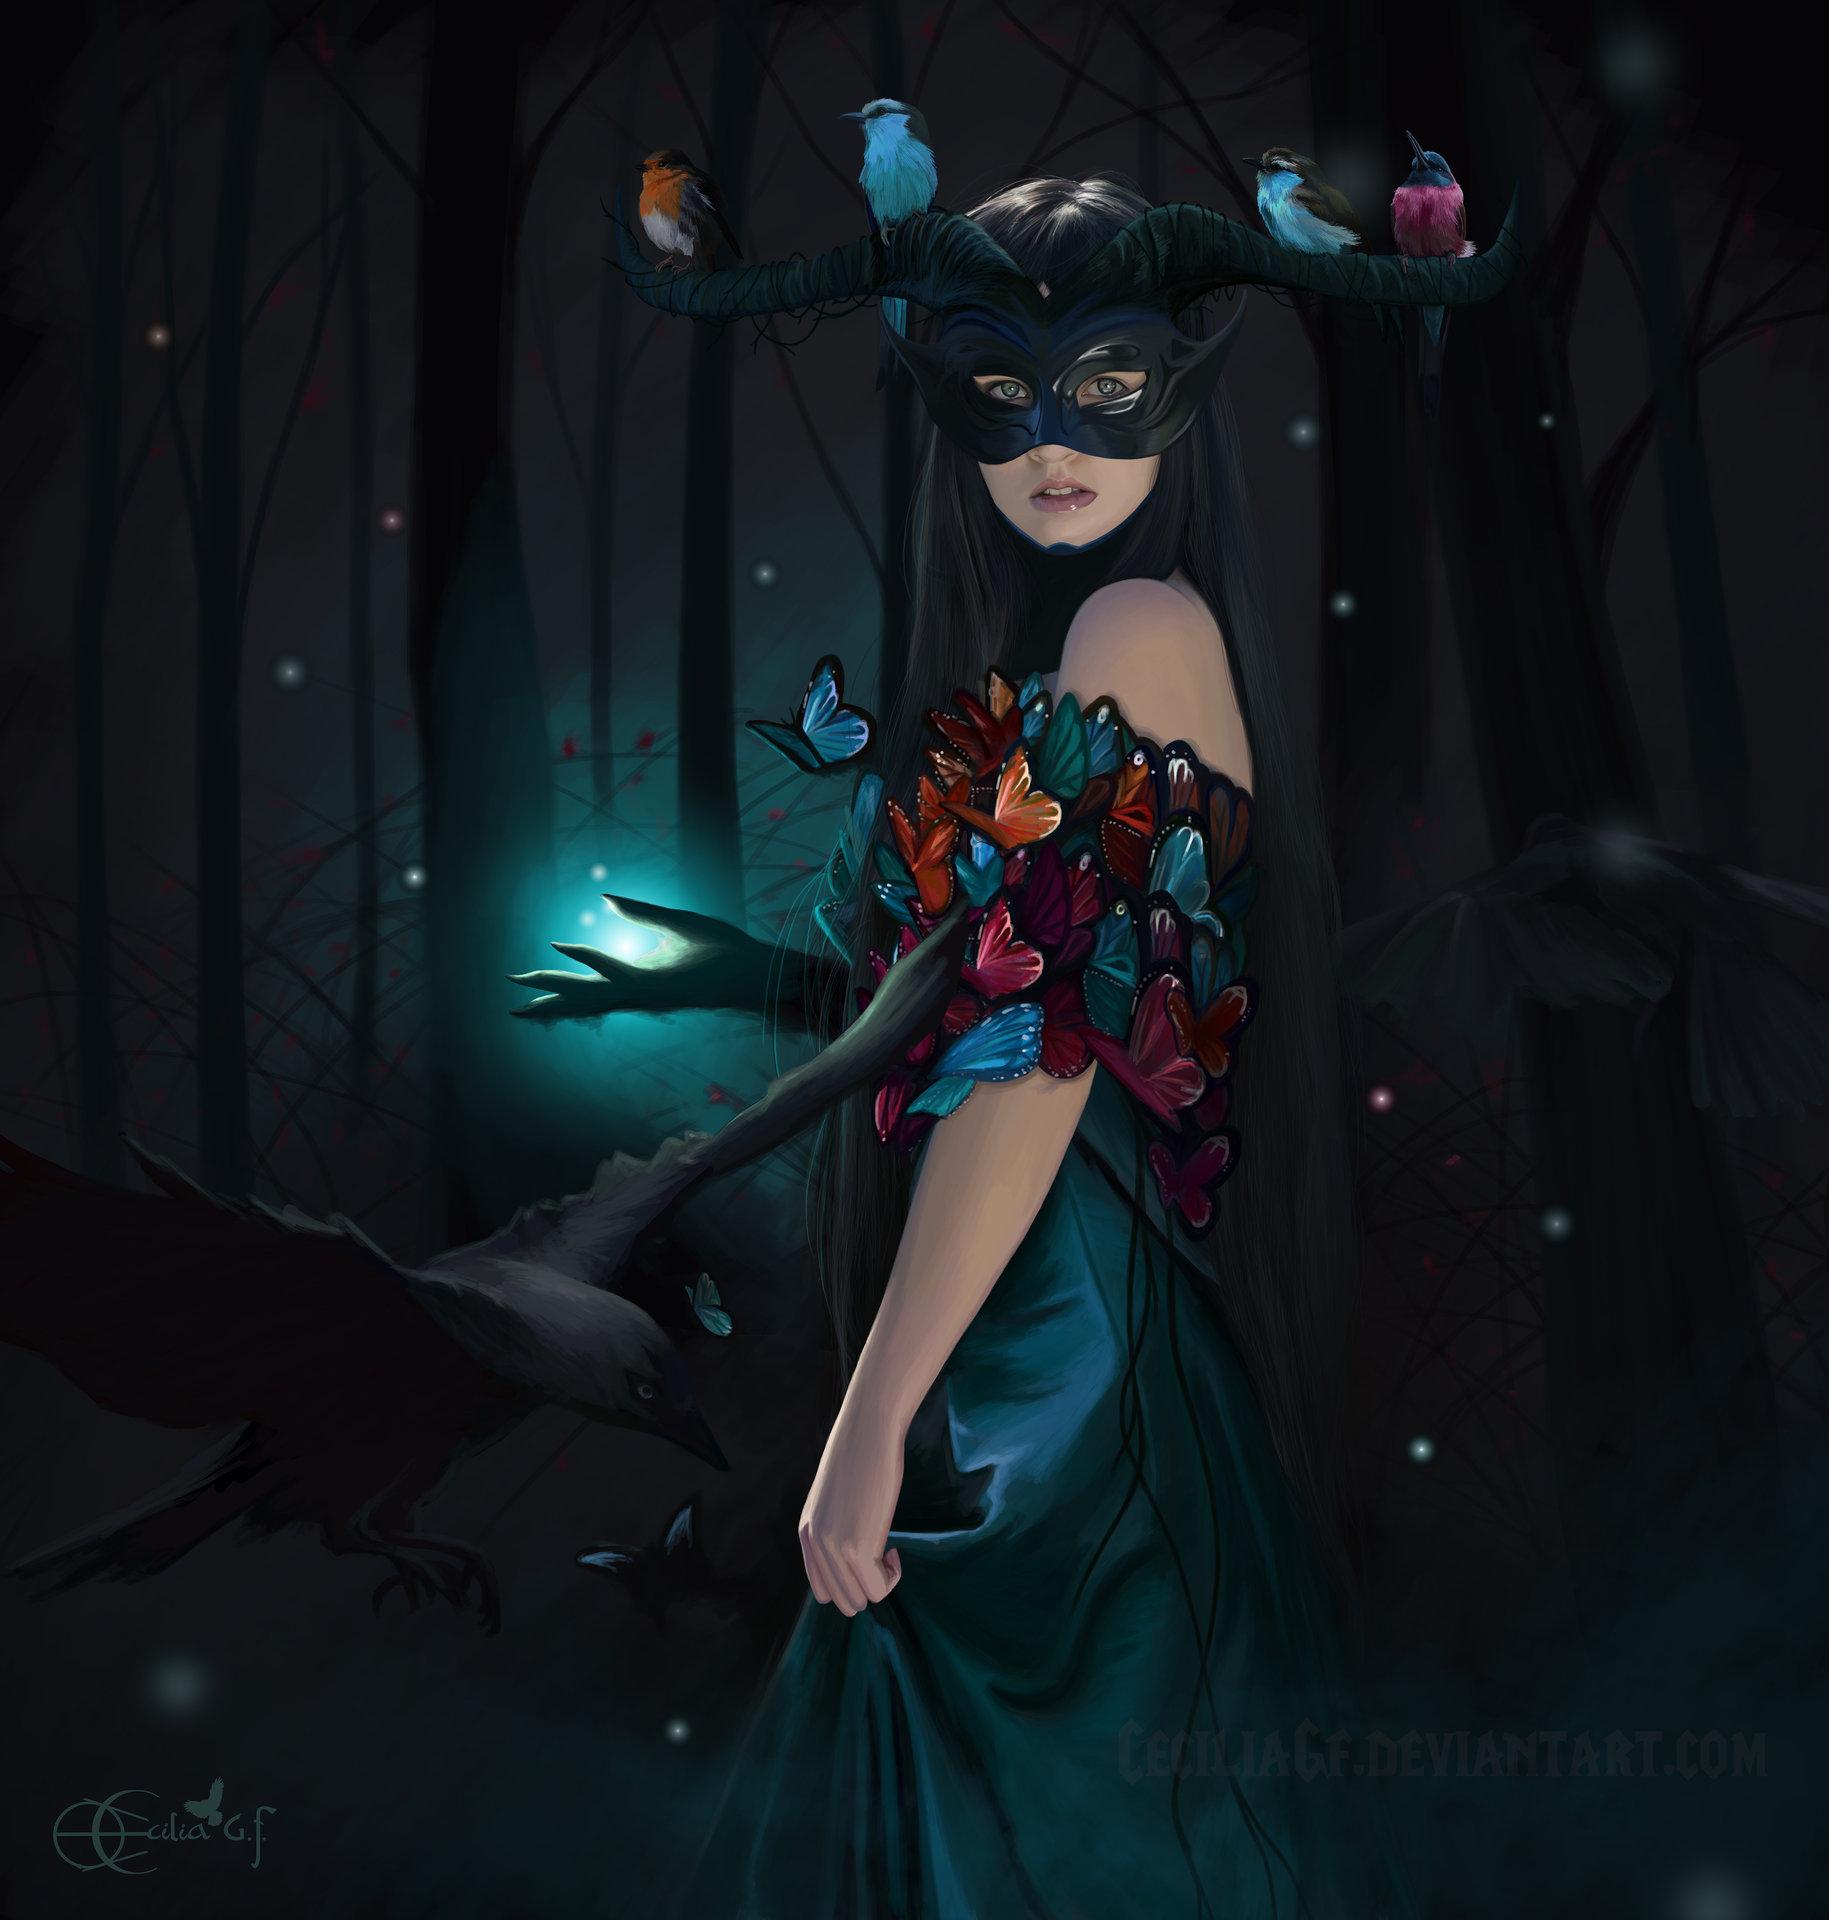 Фото Девушка с рогами на голове, на которых сидят птички и с бабочками на ней стоит в волшебном лесу, by Cecilia G. F